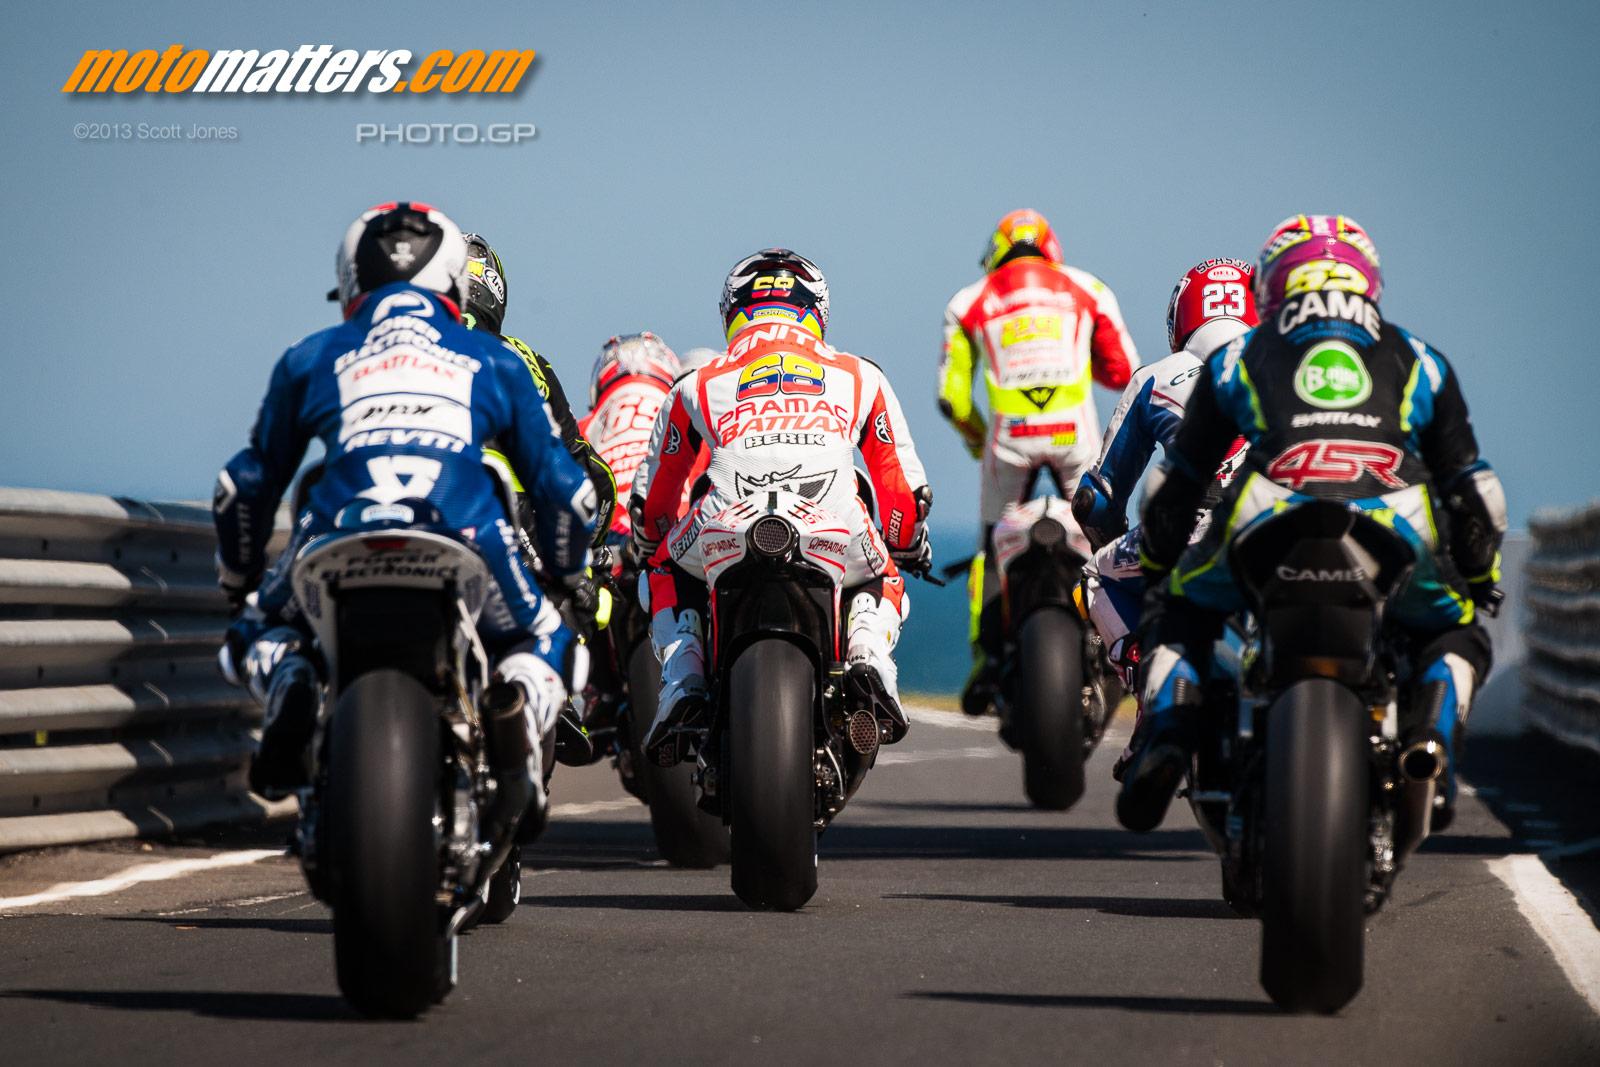 GP Phillip Island - Page 4 2013-MotoGP-16-Phillip-Island-Friday-1120-O